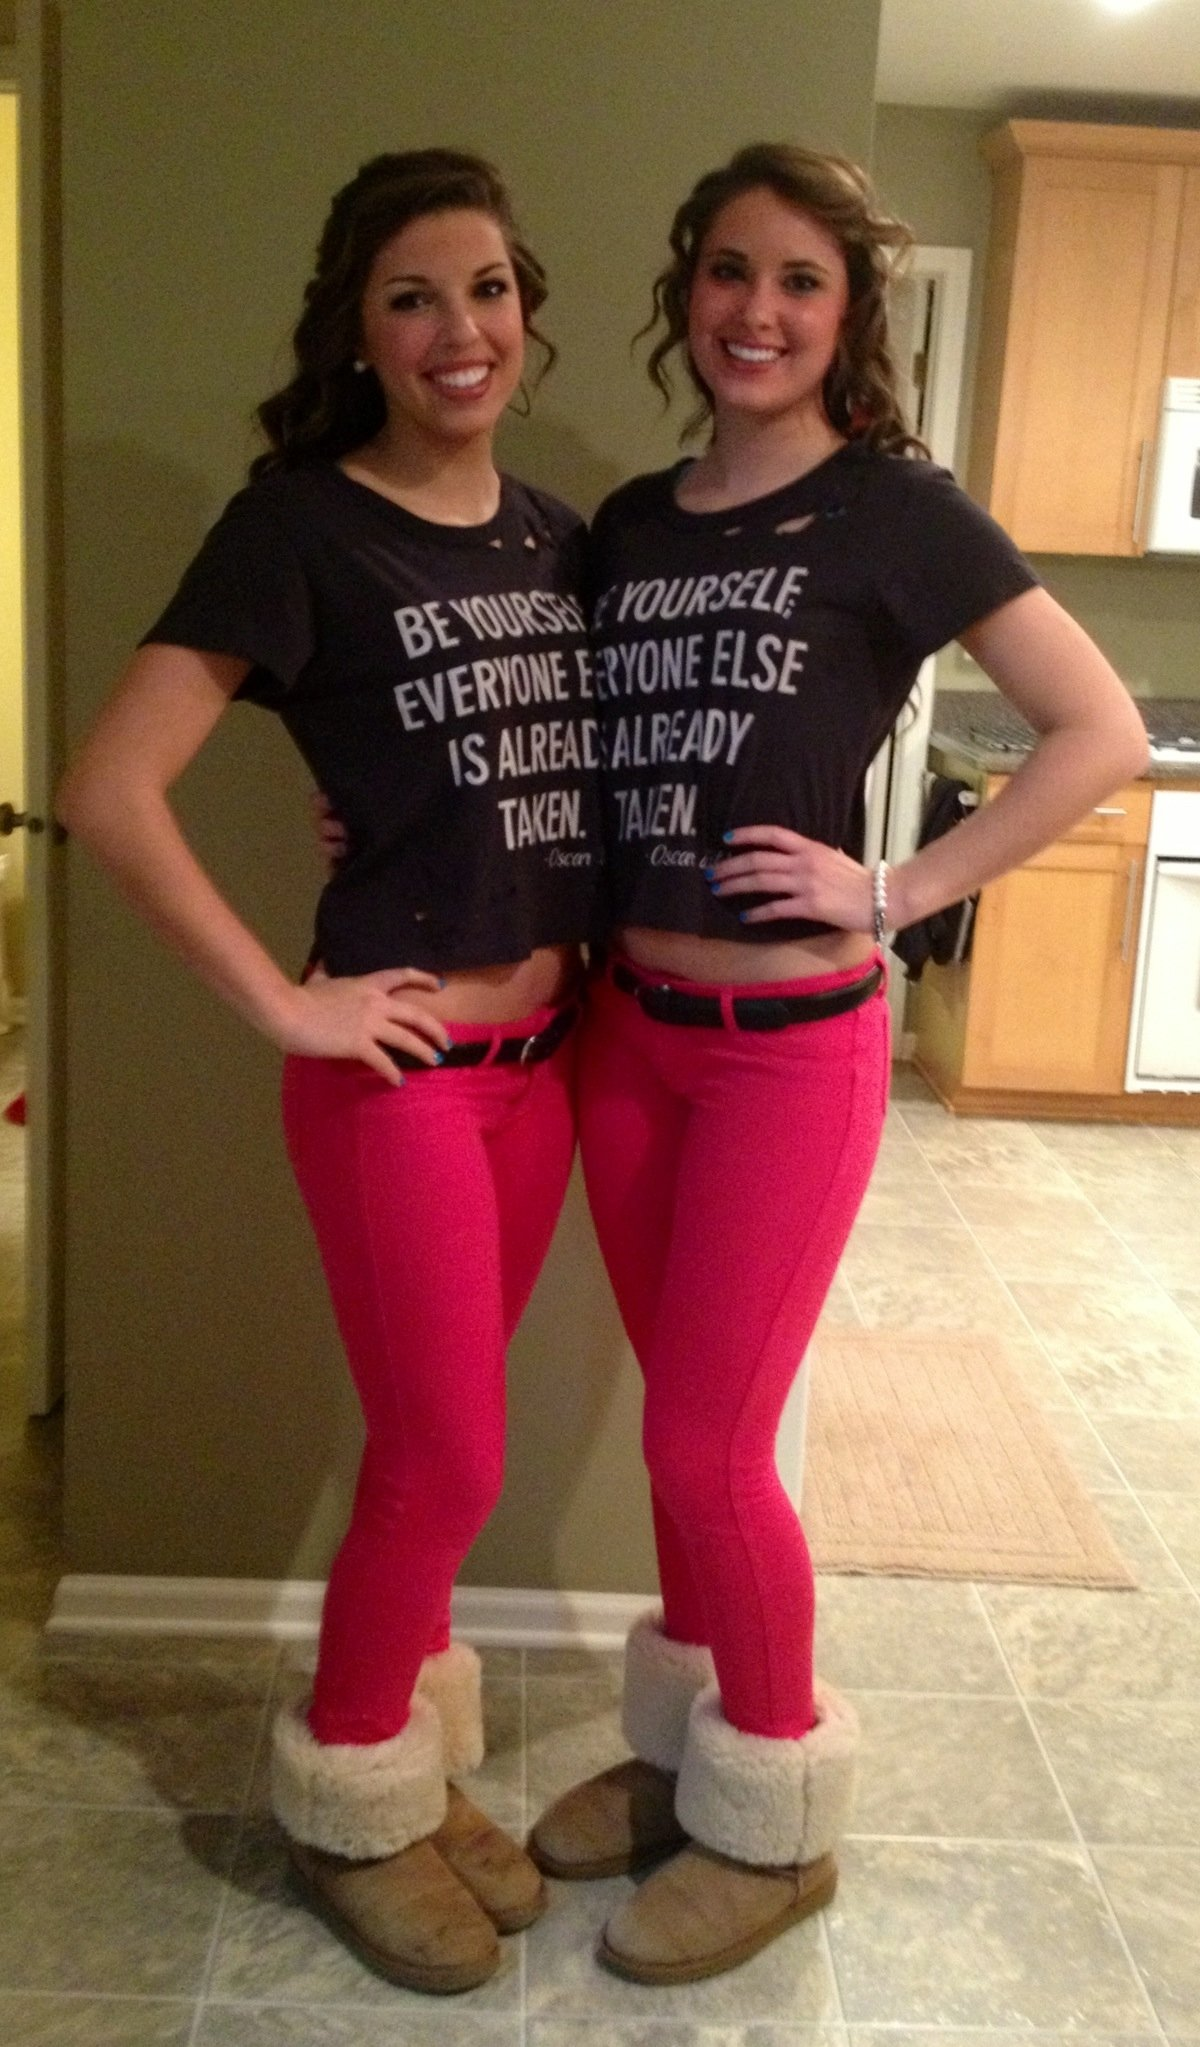 10 Nice Best Friend Halloween Costume Ideas best friend twins 3 funny halloween costumes funny stuff 10 2020